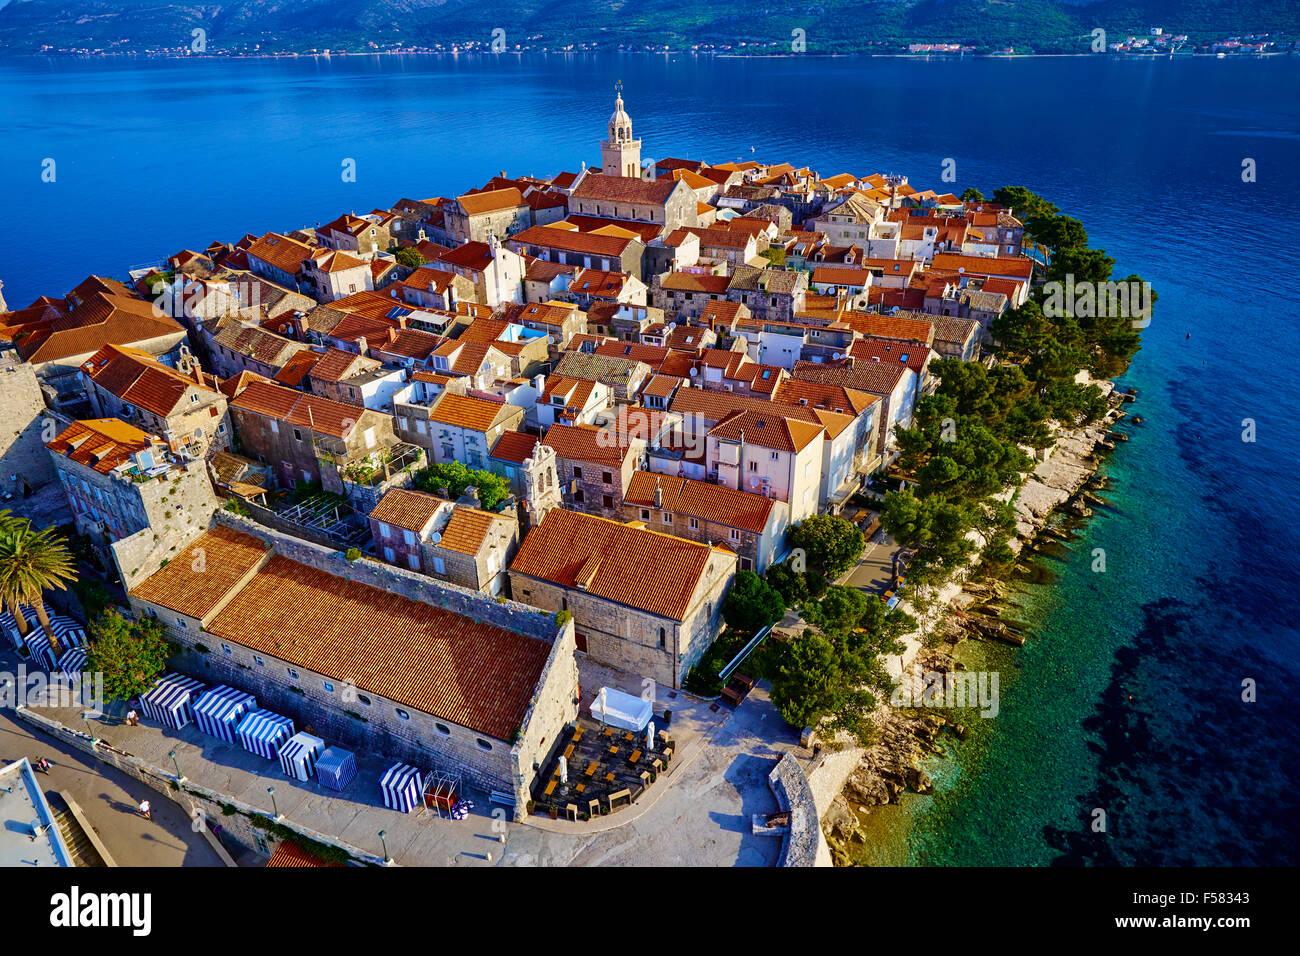 Croatia, Dalmatia, Korcula island, Korcula city, aerial view - Stock Image